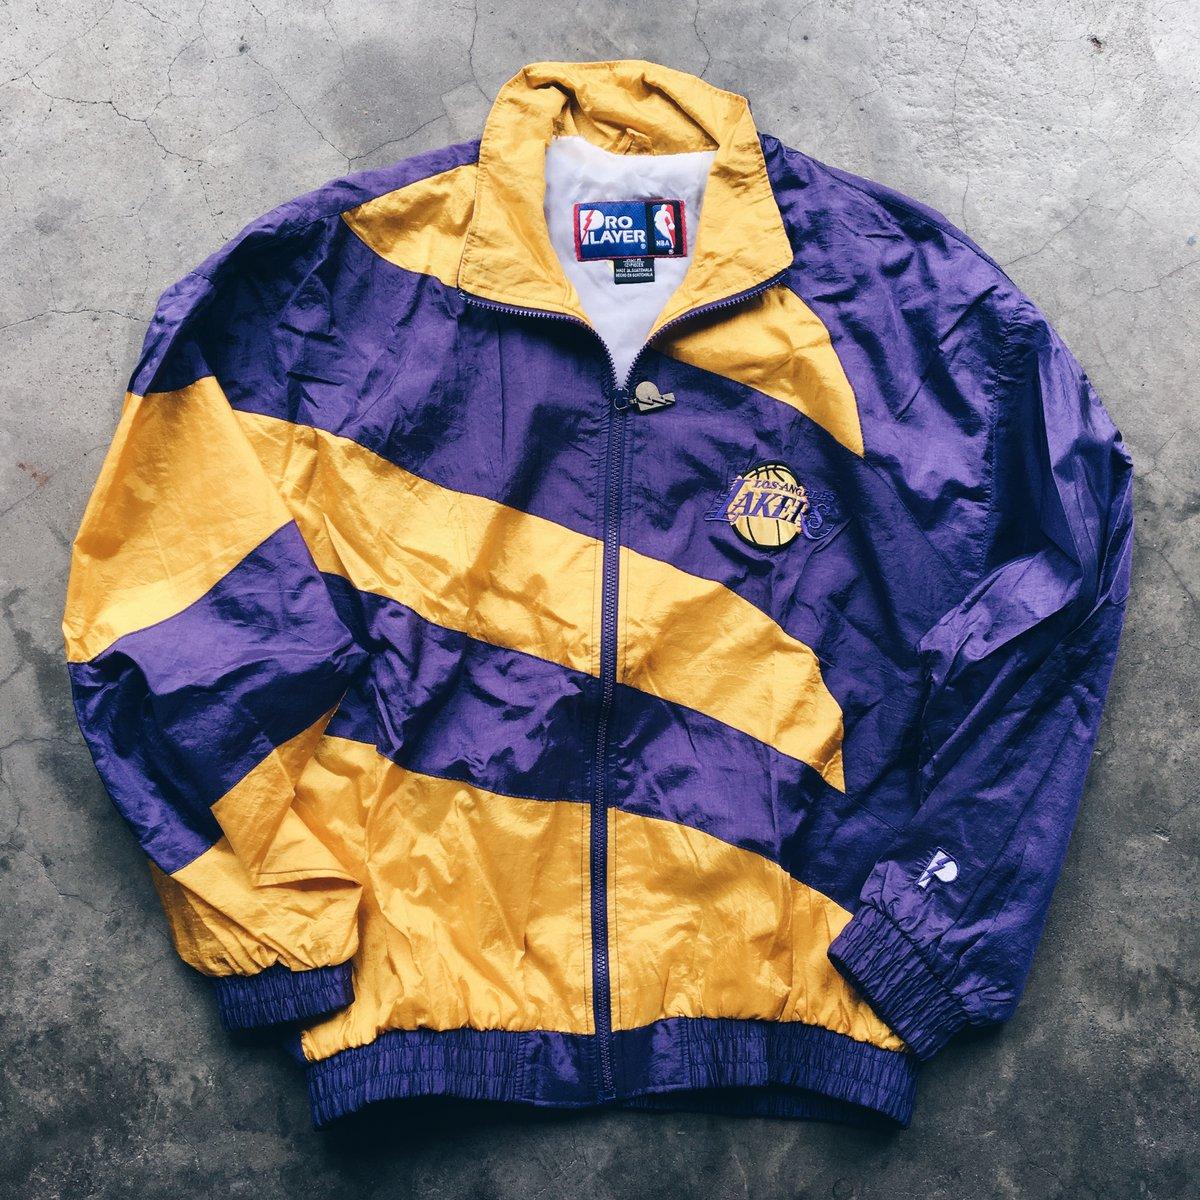 Image of Original 90's Pro Player Los Angeles Lakers Windbreaker Jacket.